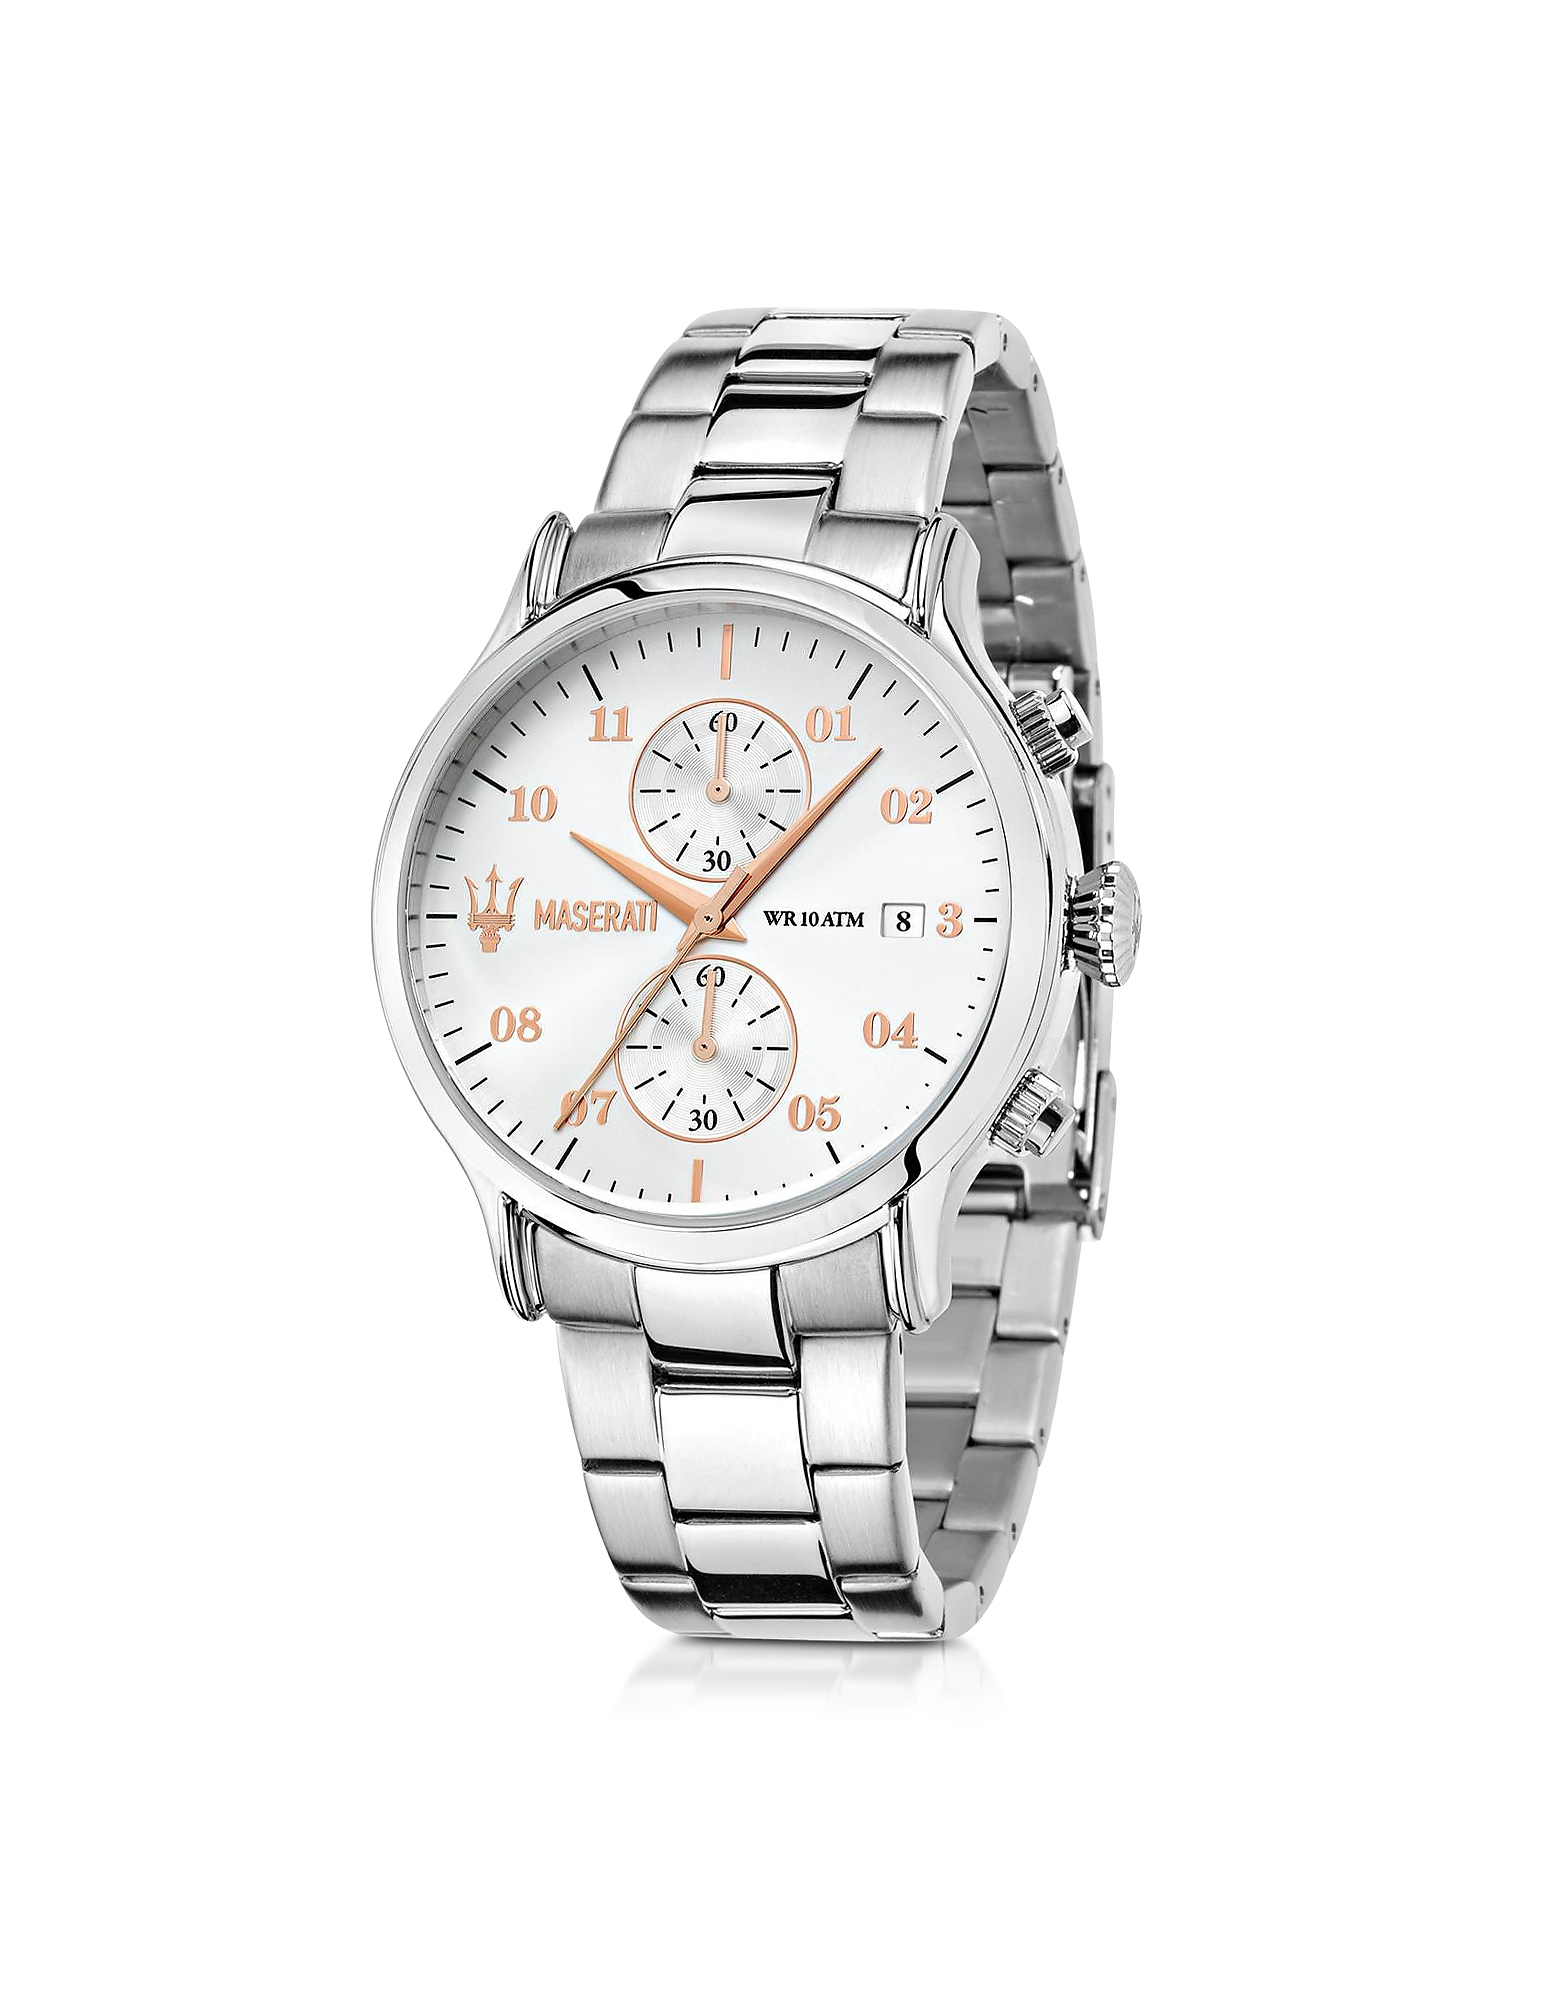 Maserati Men's Watches, Epoca Chronograph Stainless Steel Men's Watch